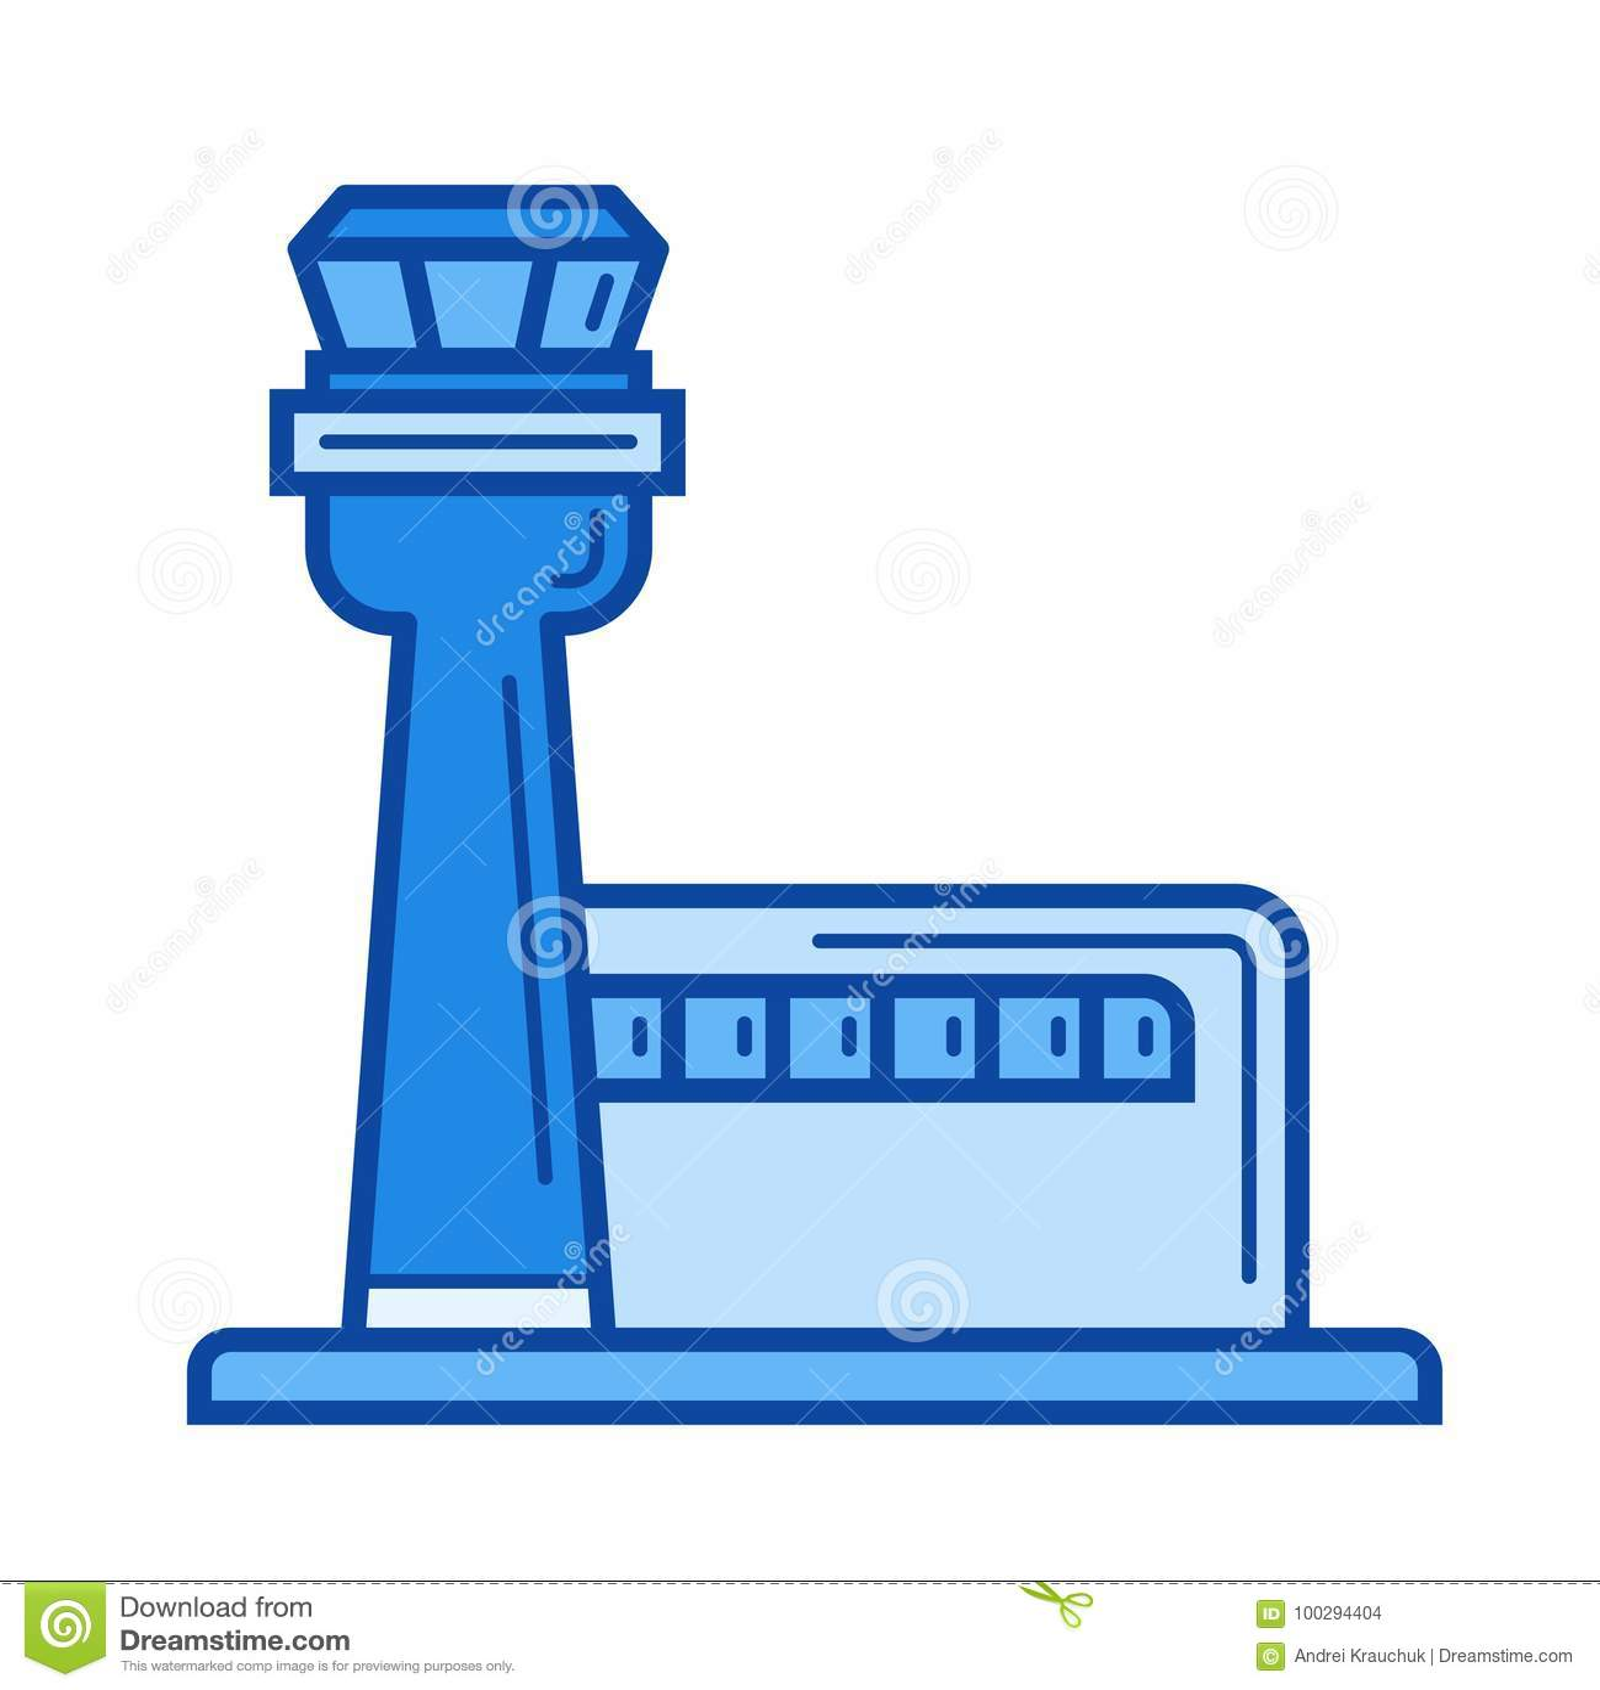 Airport Terminal Line Icon Stock Vector Illustration Of Radar